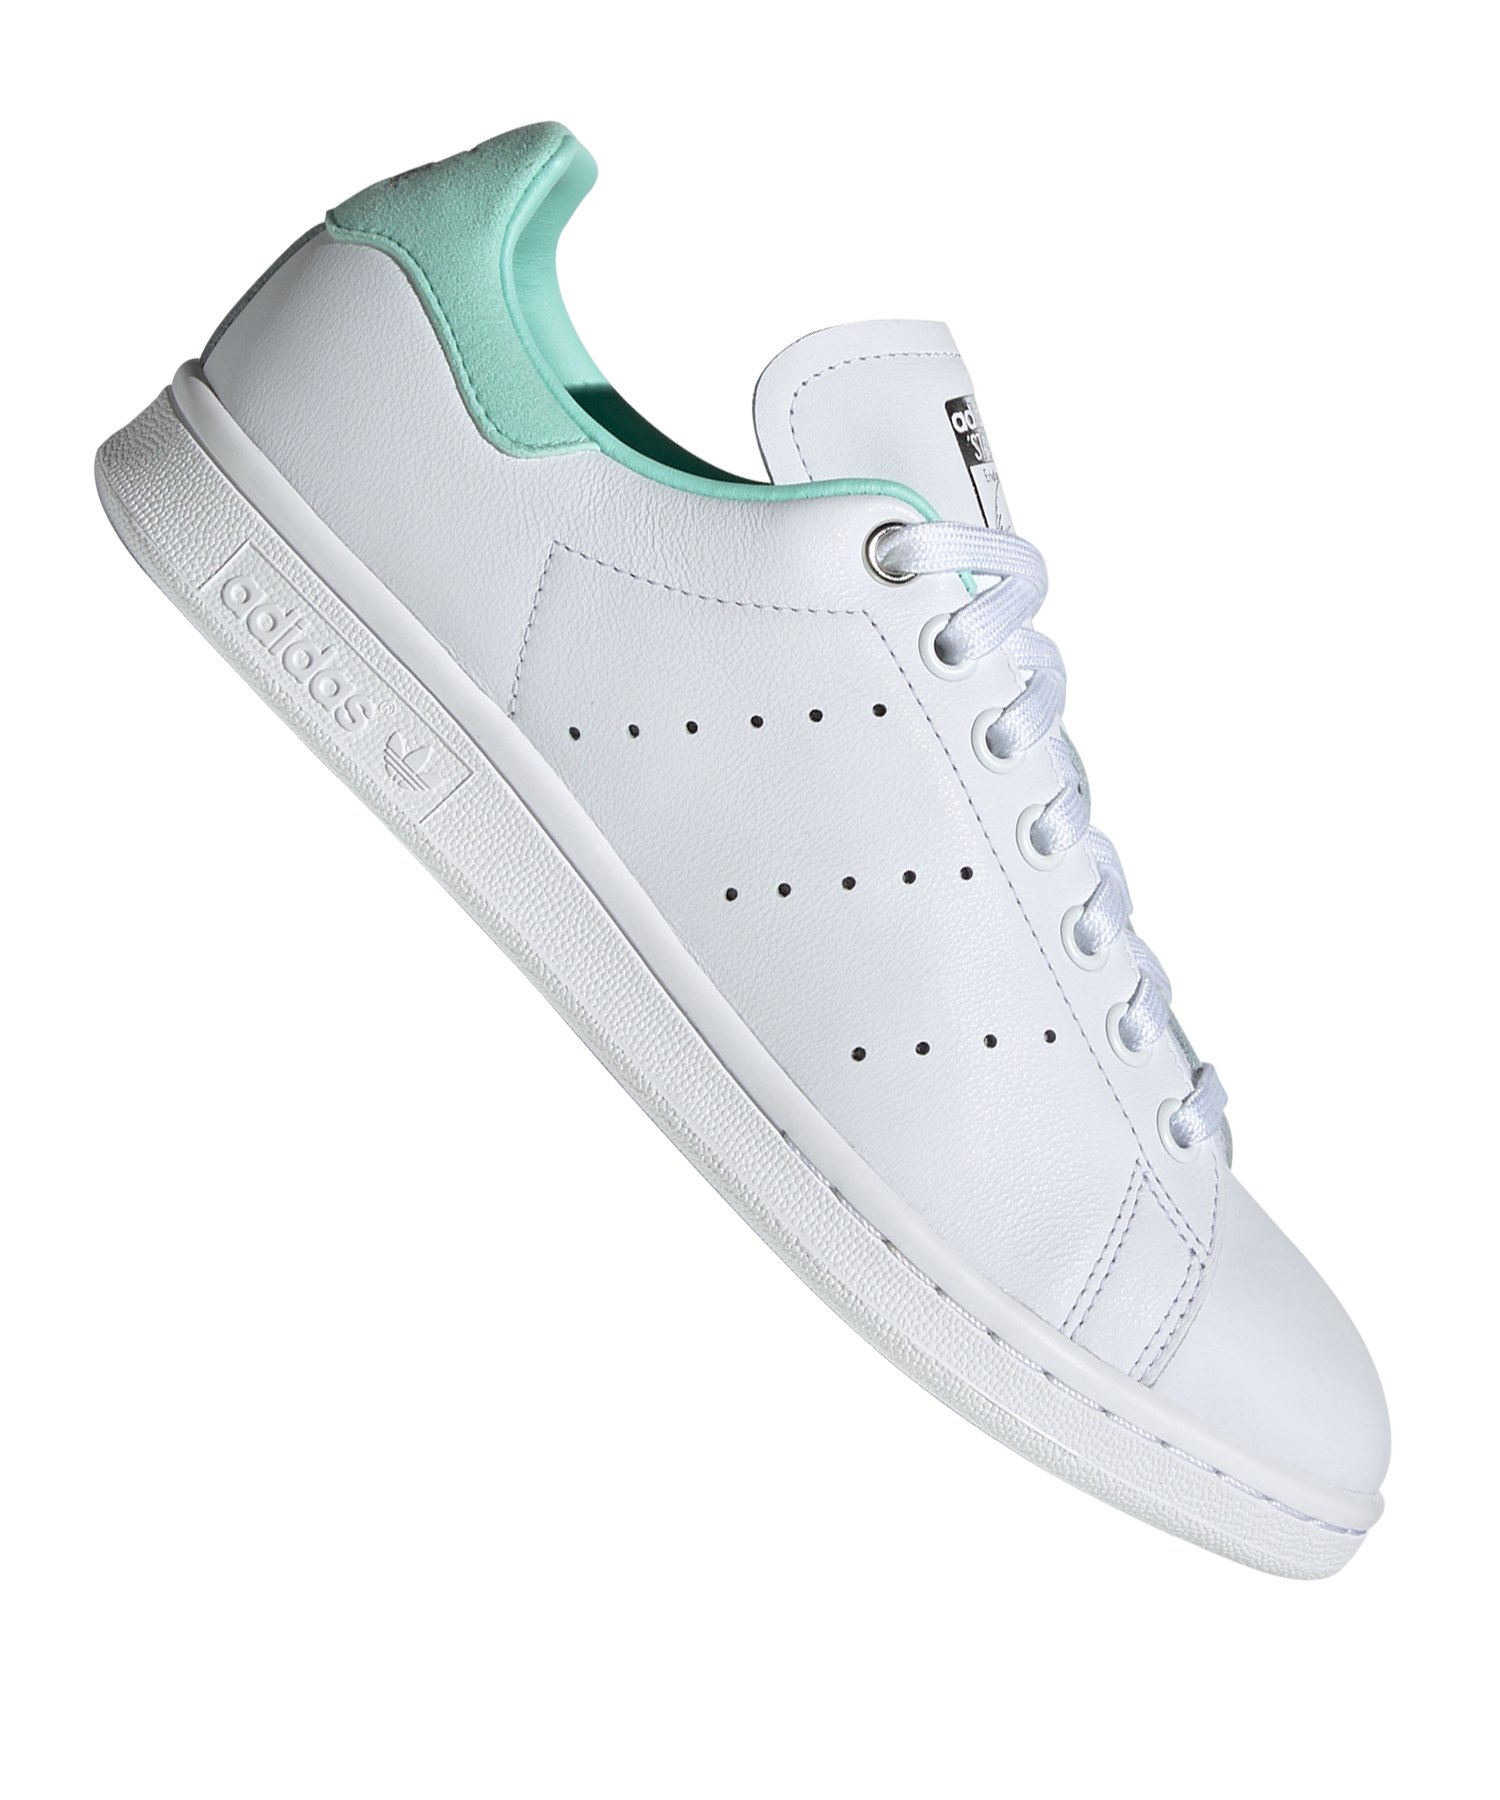 Frauen Adidas Originals Sneaker Weiss Adidas Originals Stan